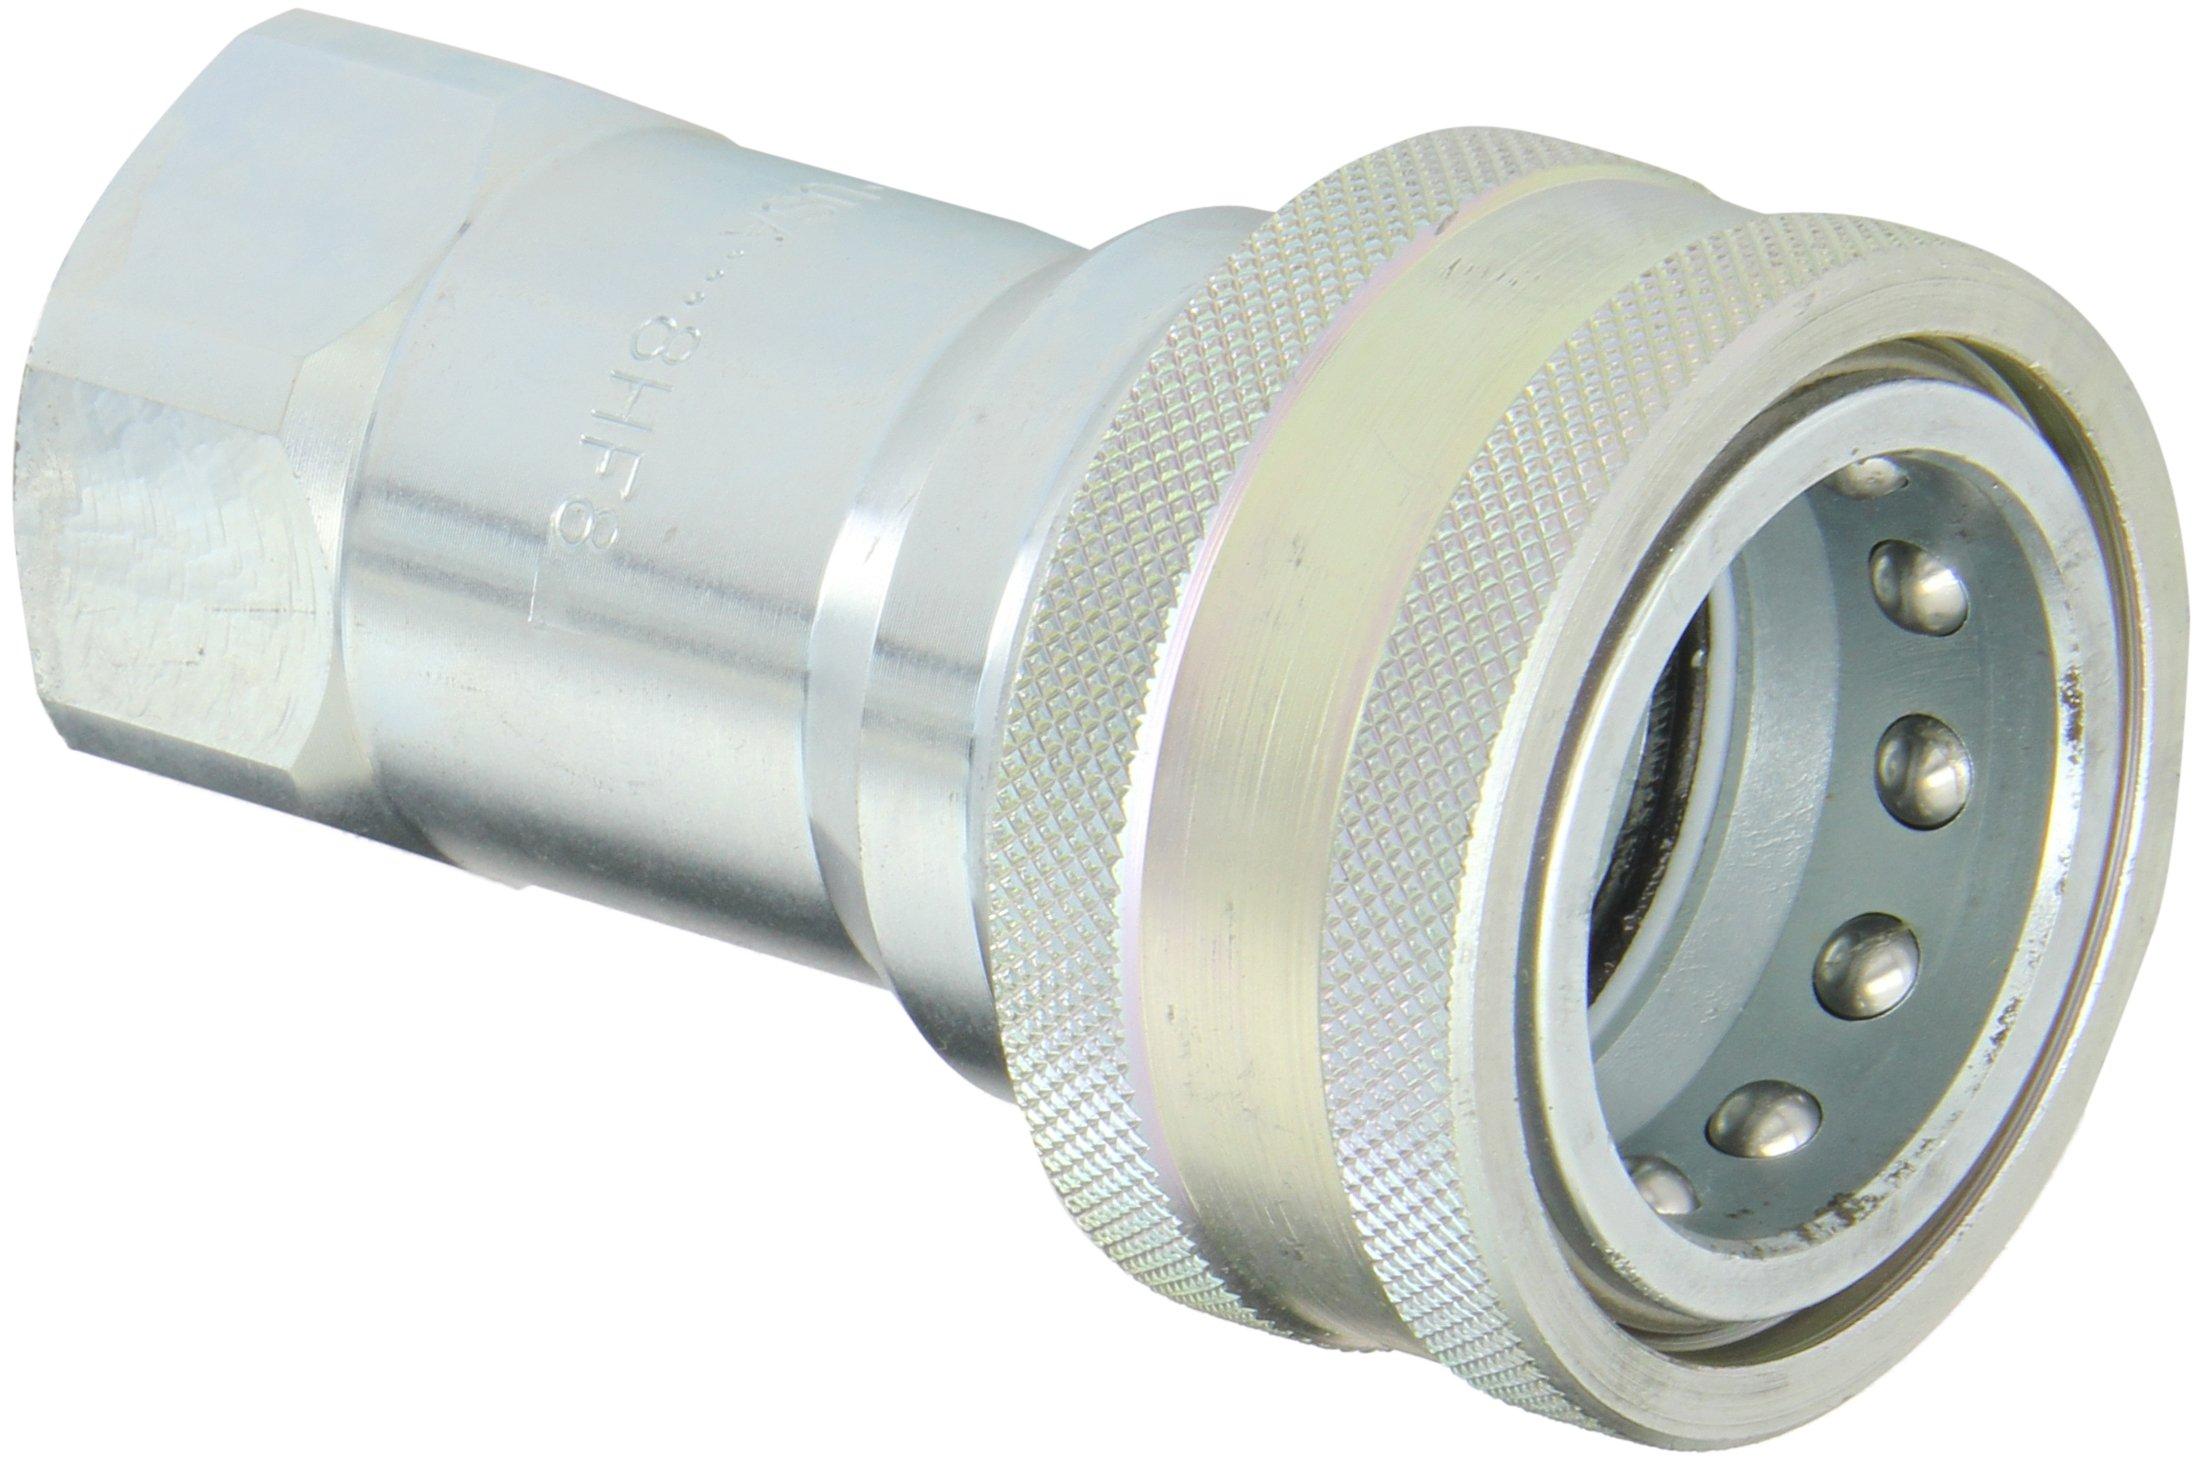 Dixon Valve & Coupling 8HF8 Steel ISO-B Interchange Hydraulic Fitting, Coupler, 1'' Coupling x 1'' - 11-1/2 NPTF Female Thread